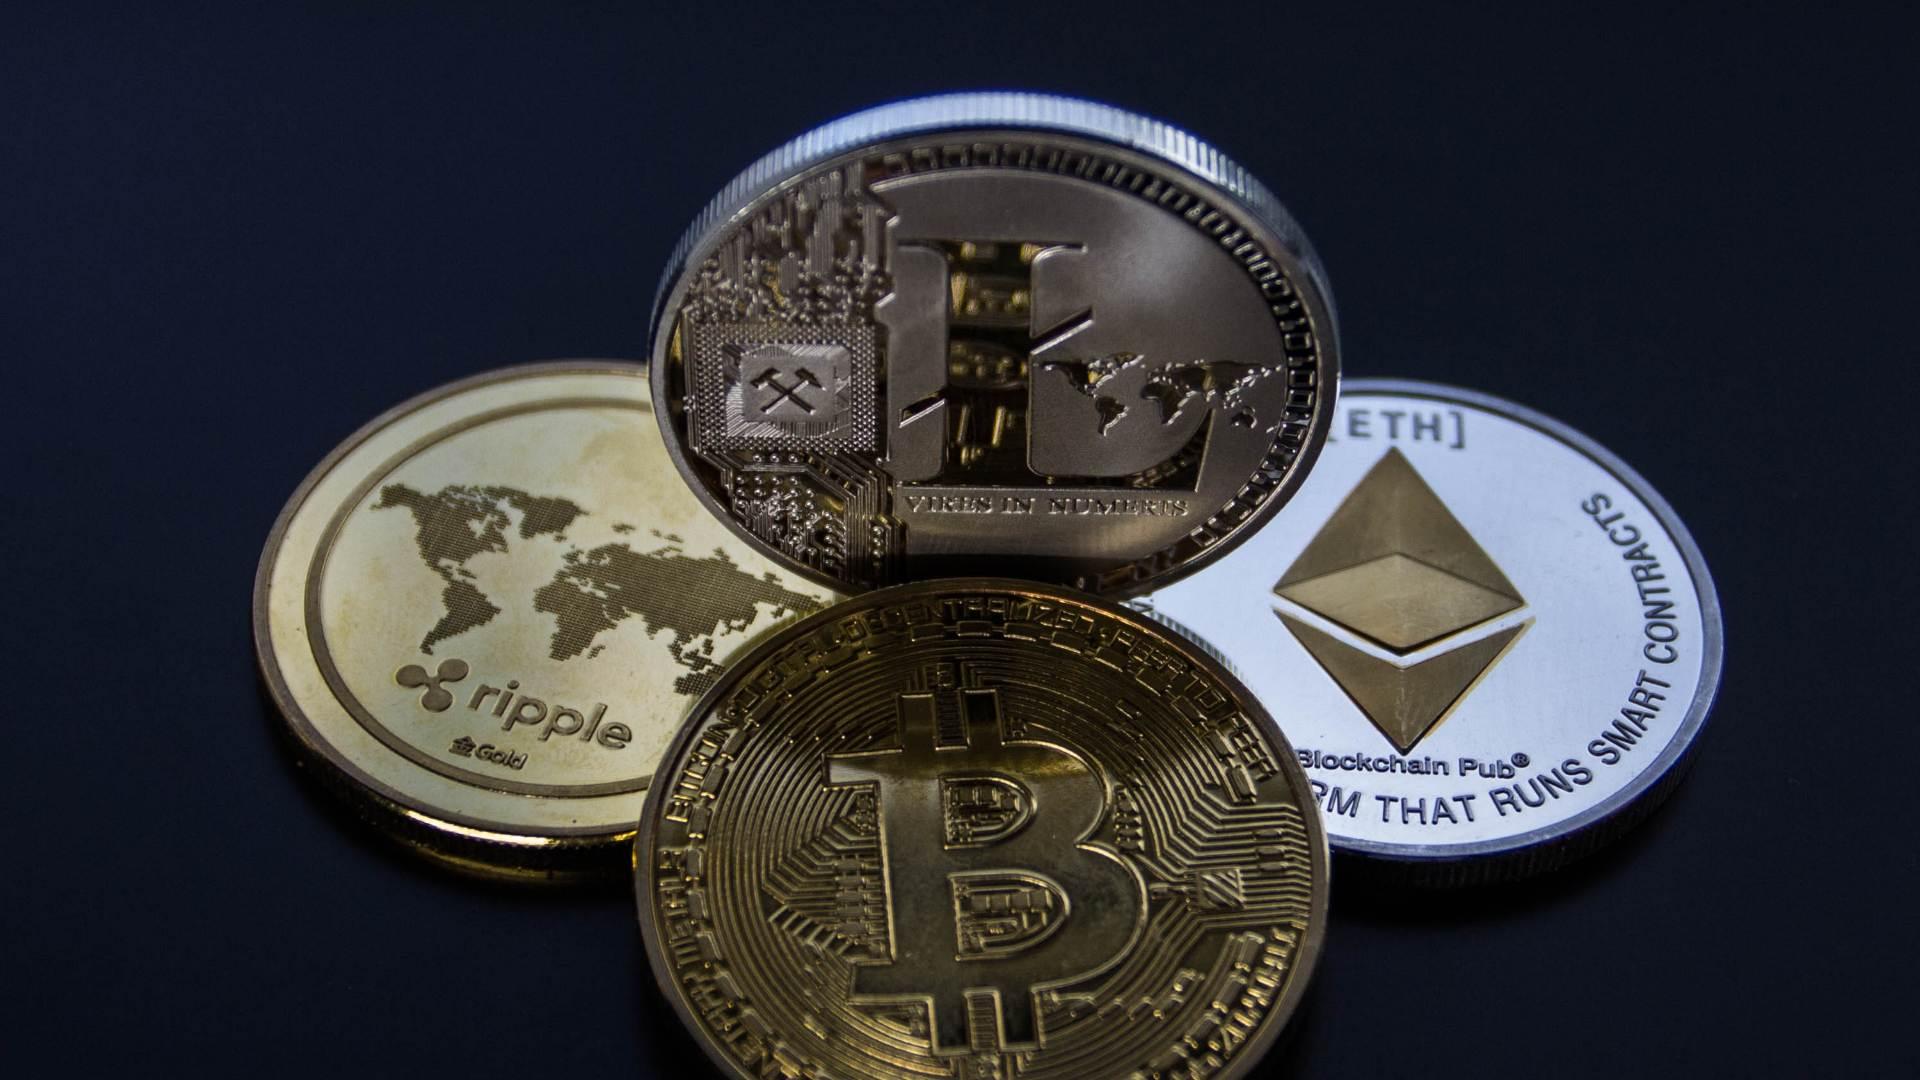 kriptovalutak mica szabalyozas